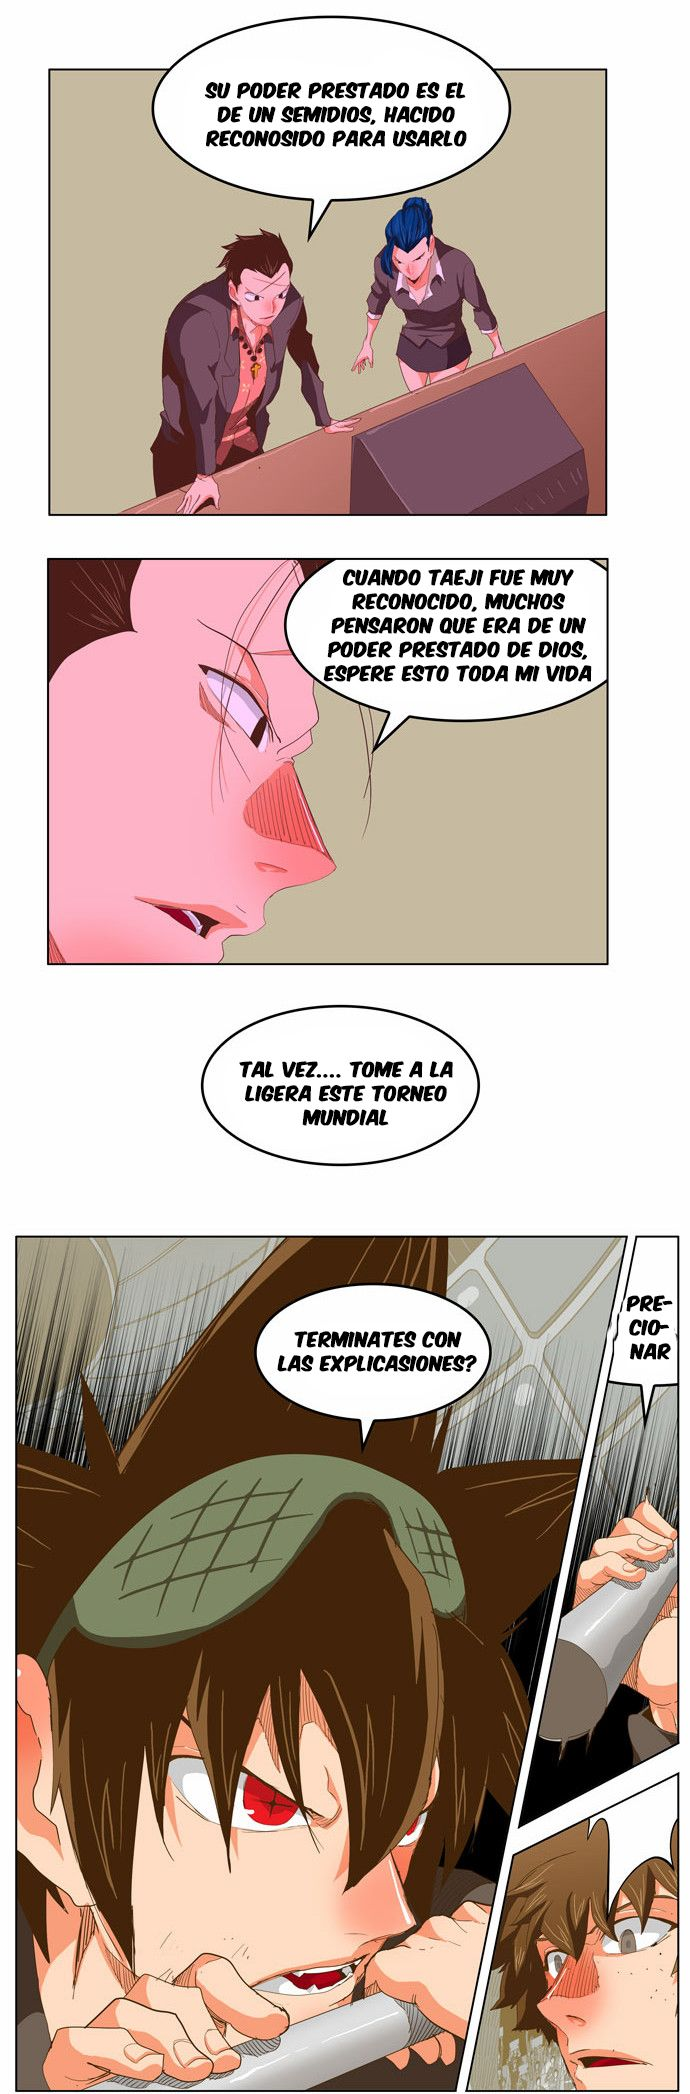 http://c5.ninemanga.com/es_manga/37/485/456291/a92b3b1a445b95b98c019157d05714c6.jpg Page 9